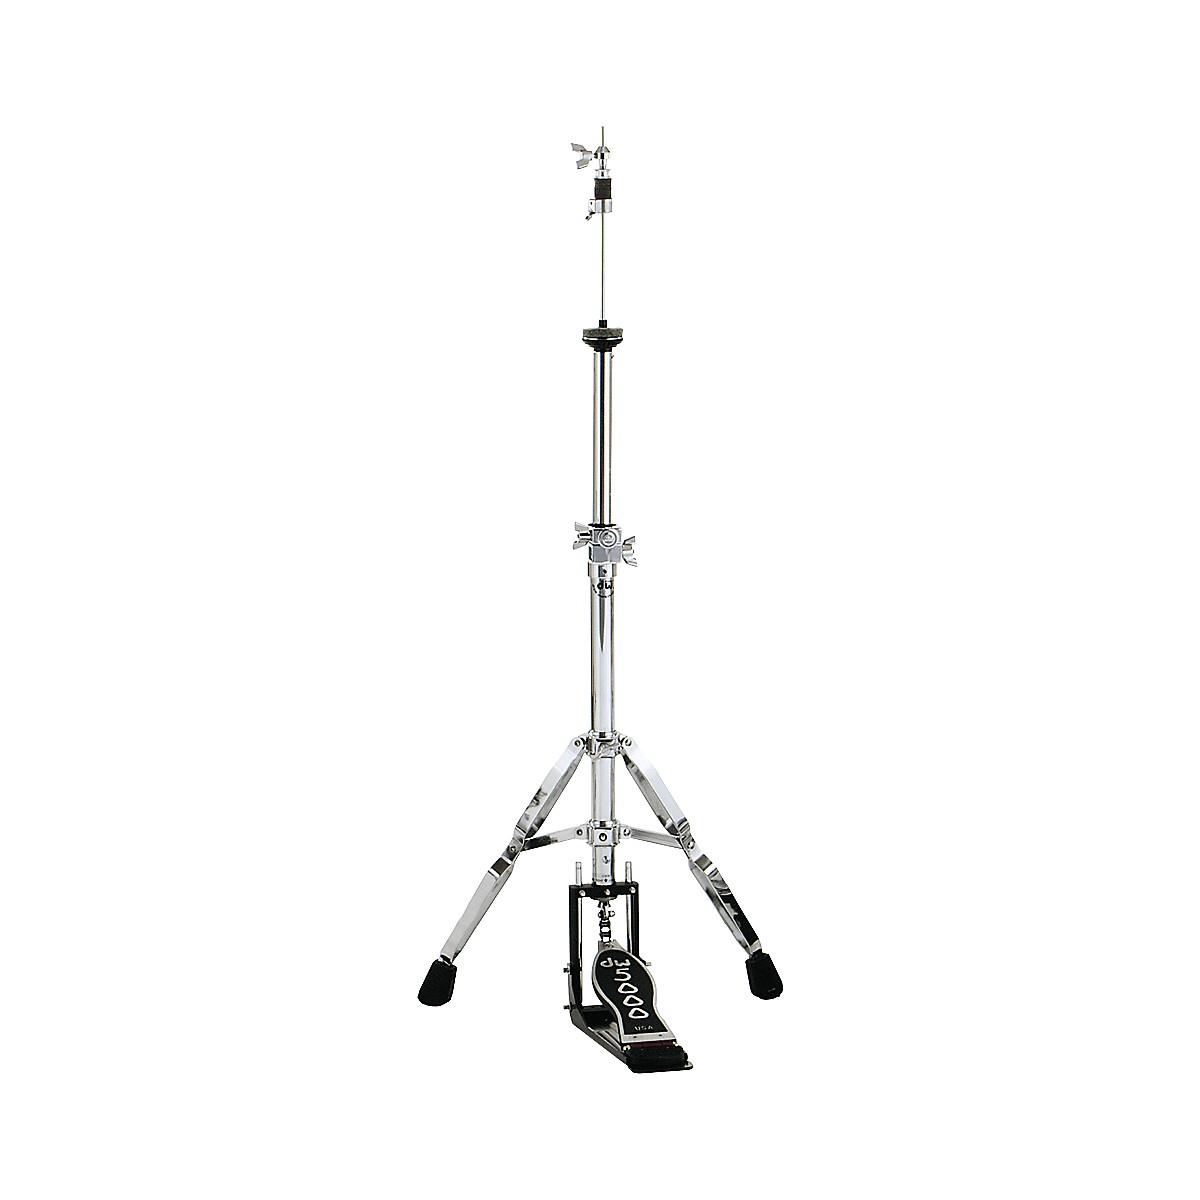 DW 5500TD Delta II Hi-Hat Cymbal Stand